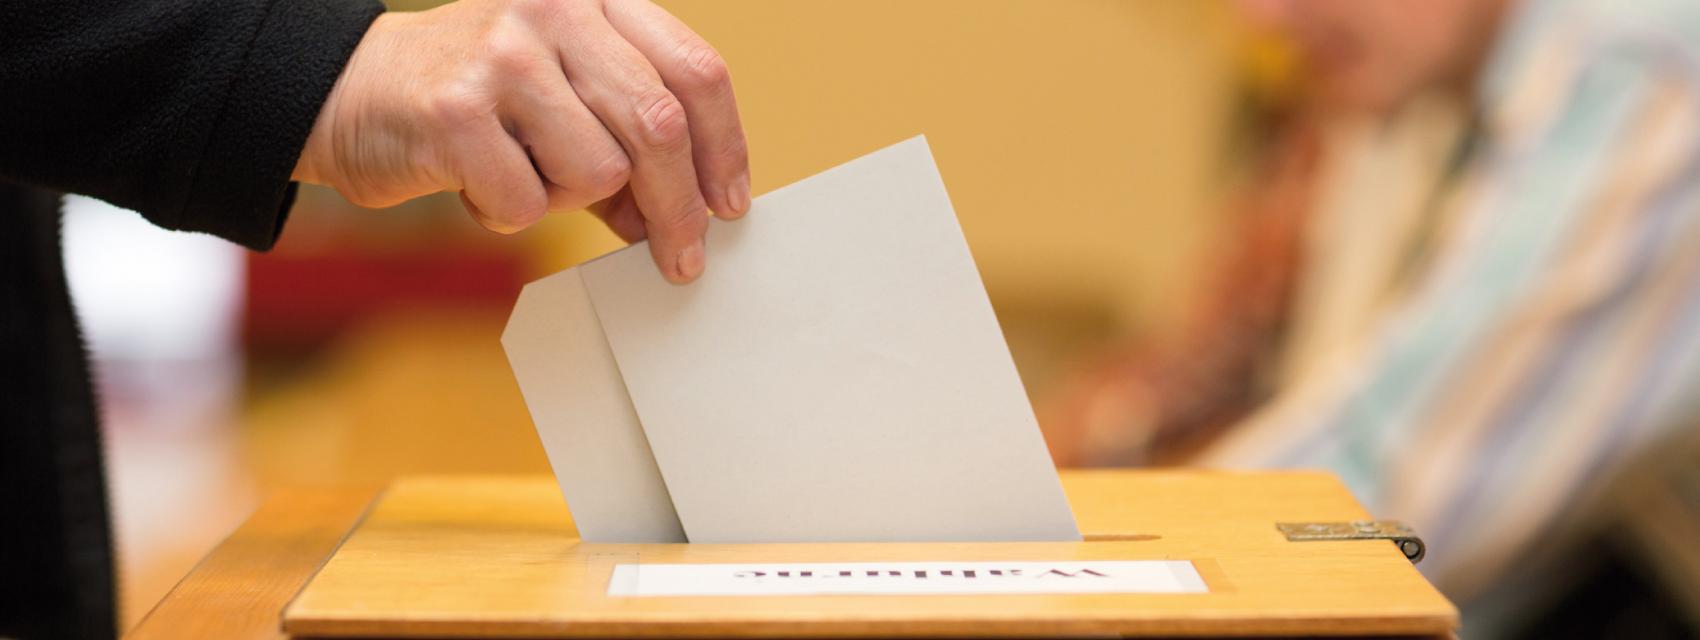 Rahden_Wahlen